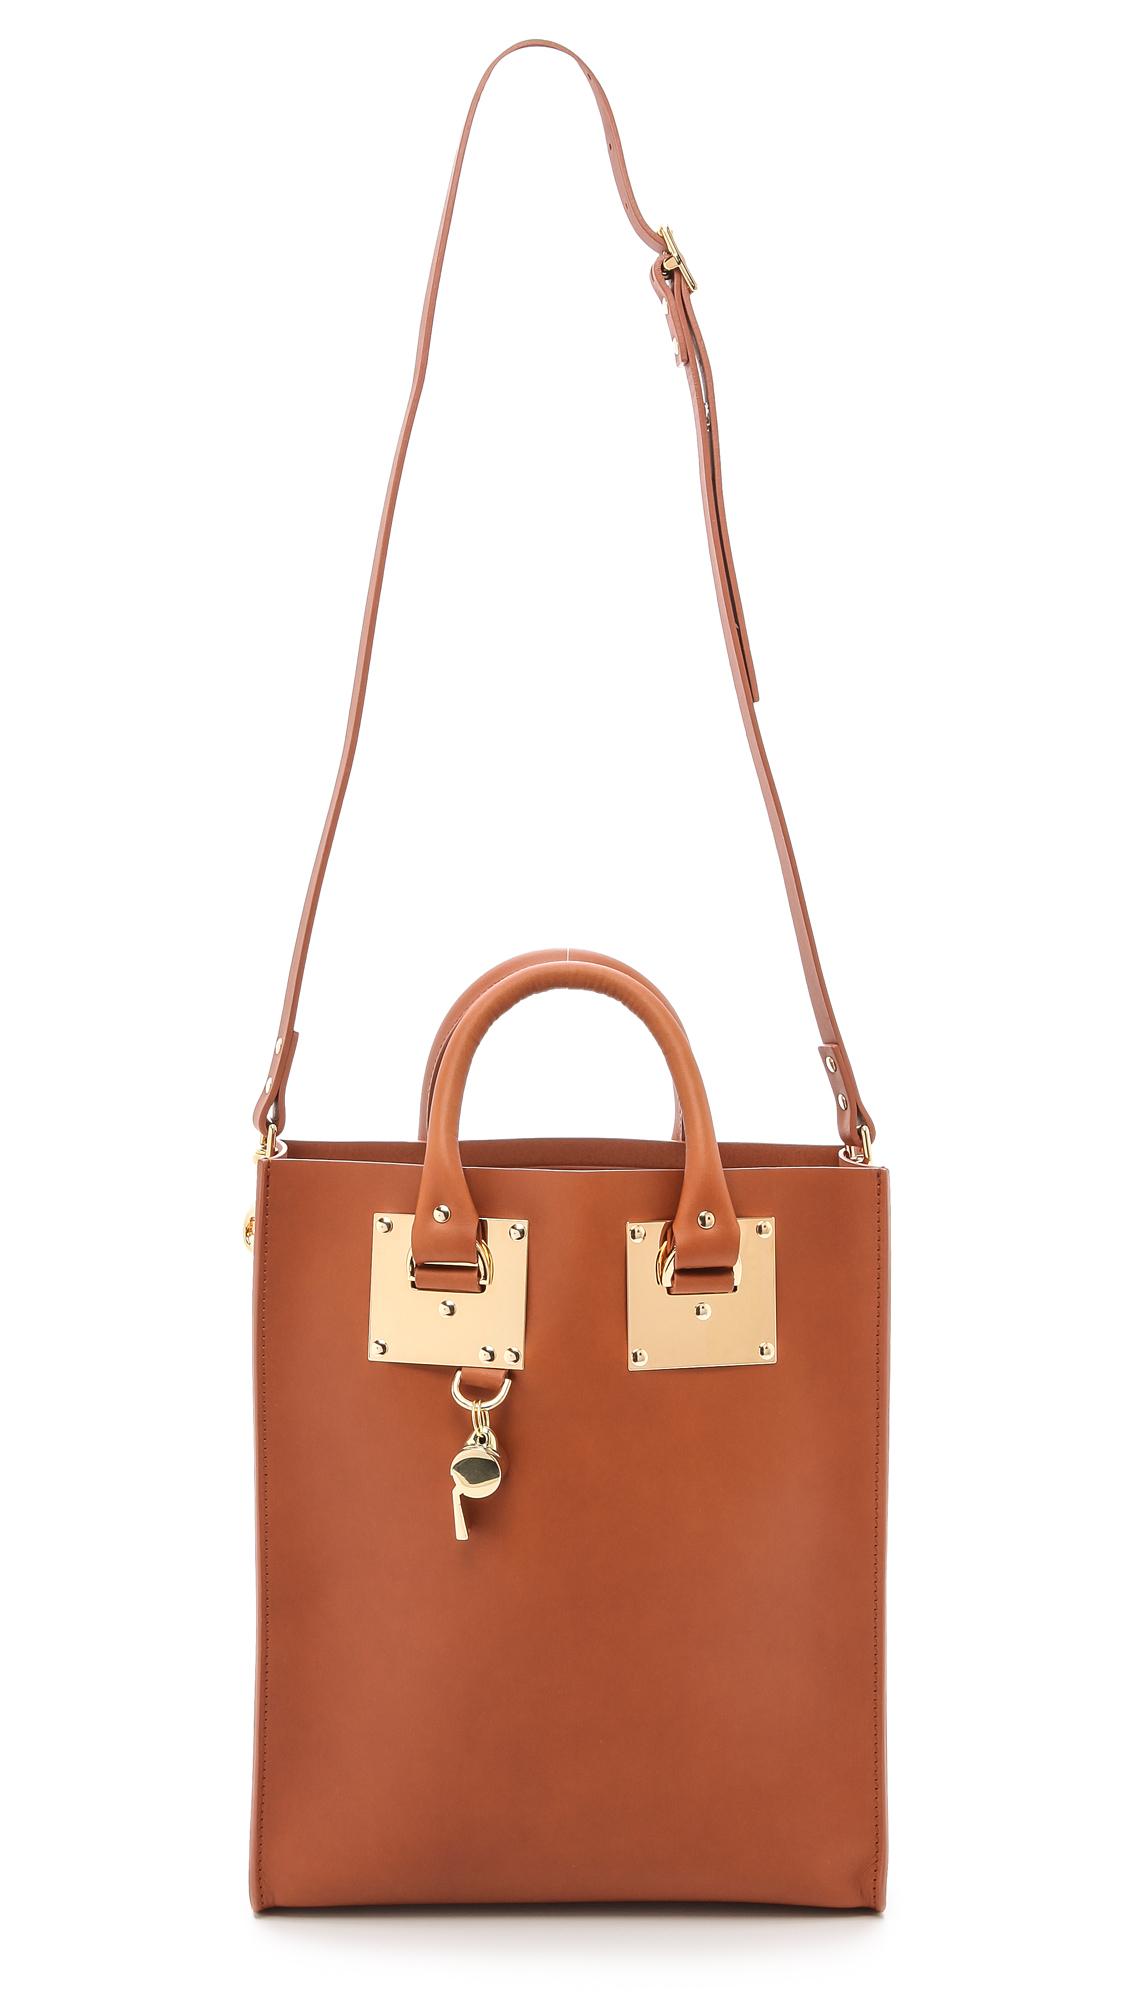 Sophie Hulme Mini Tote Bag Tan in Brown